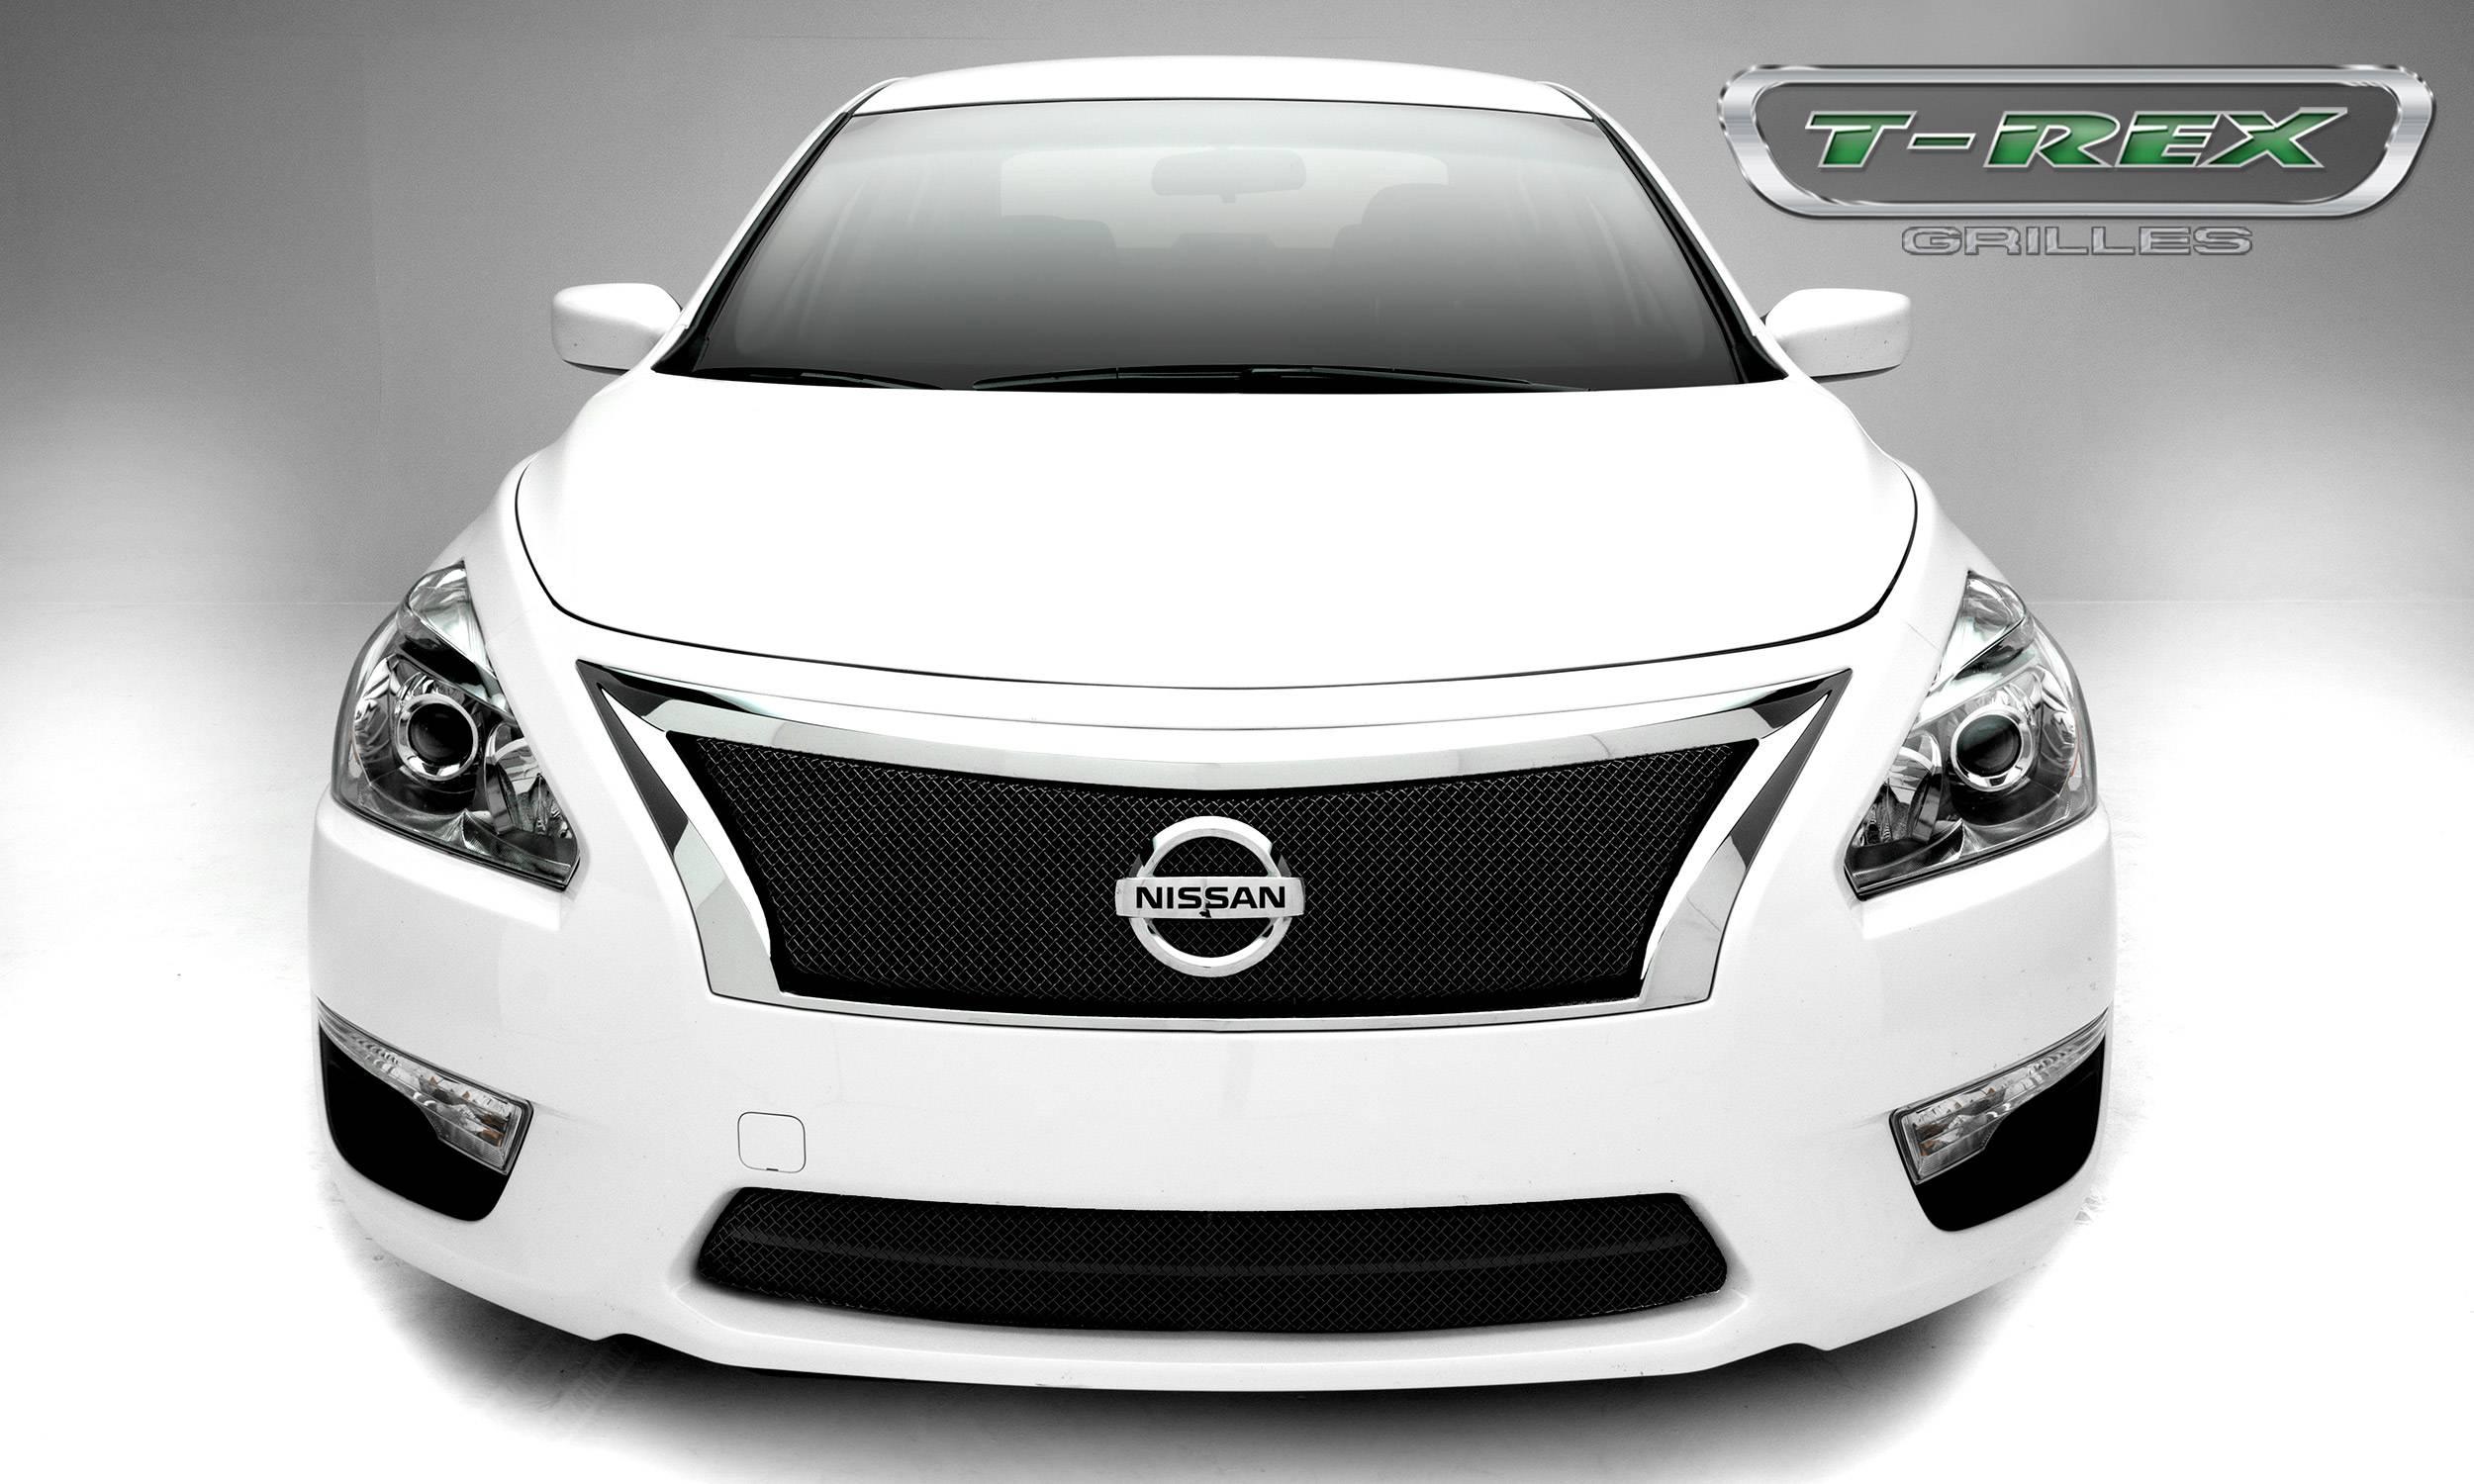 Black Nissan Altima >> Nissan Altima Black Sports Series Main Grille